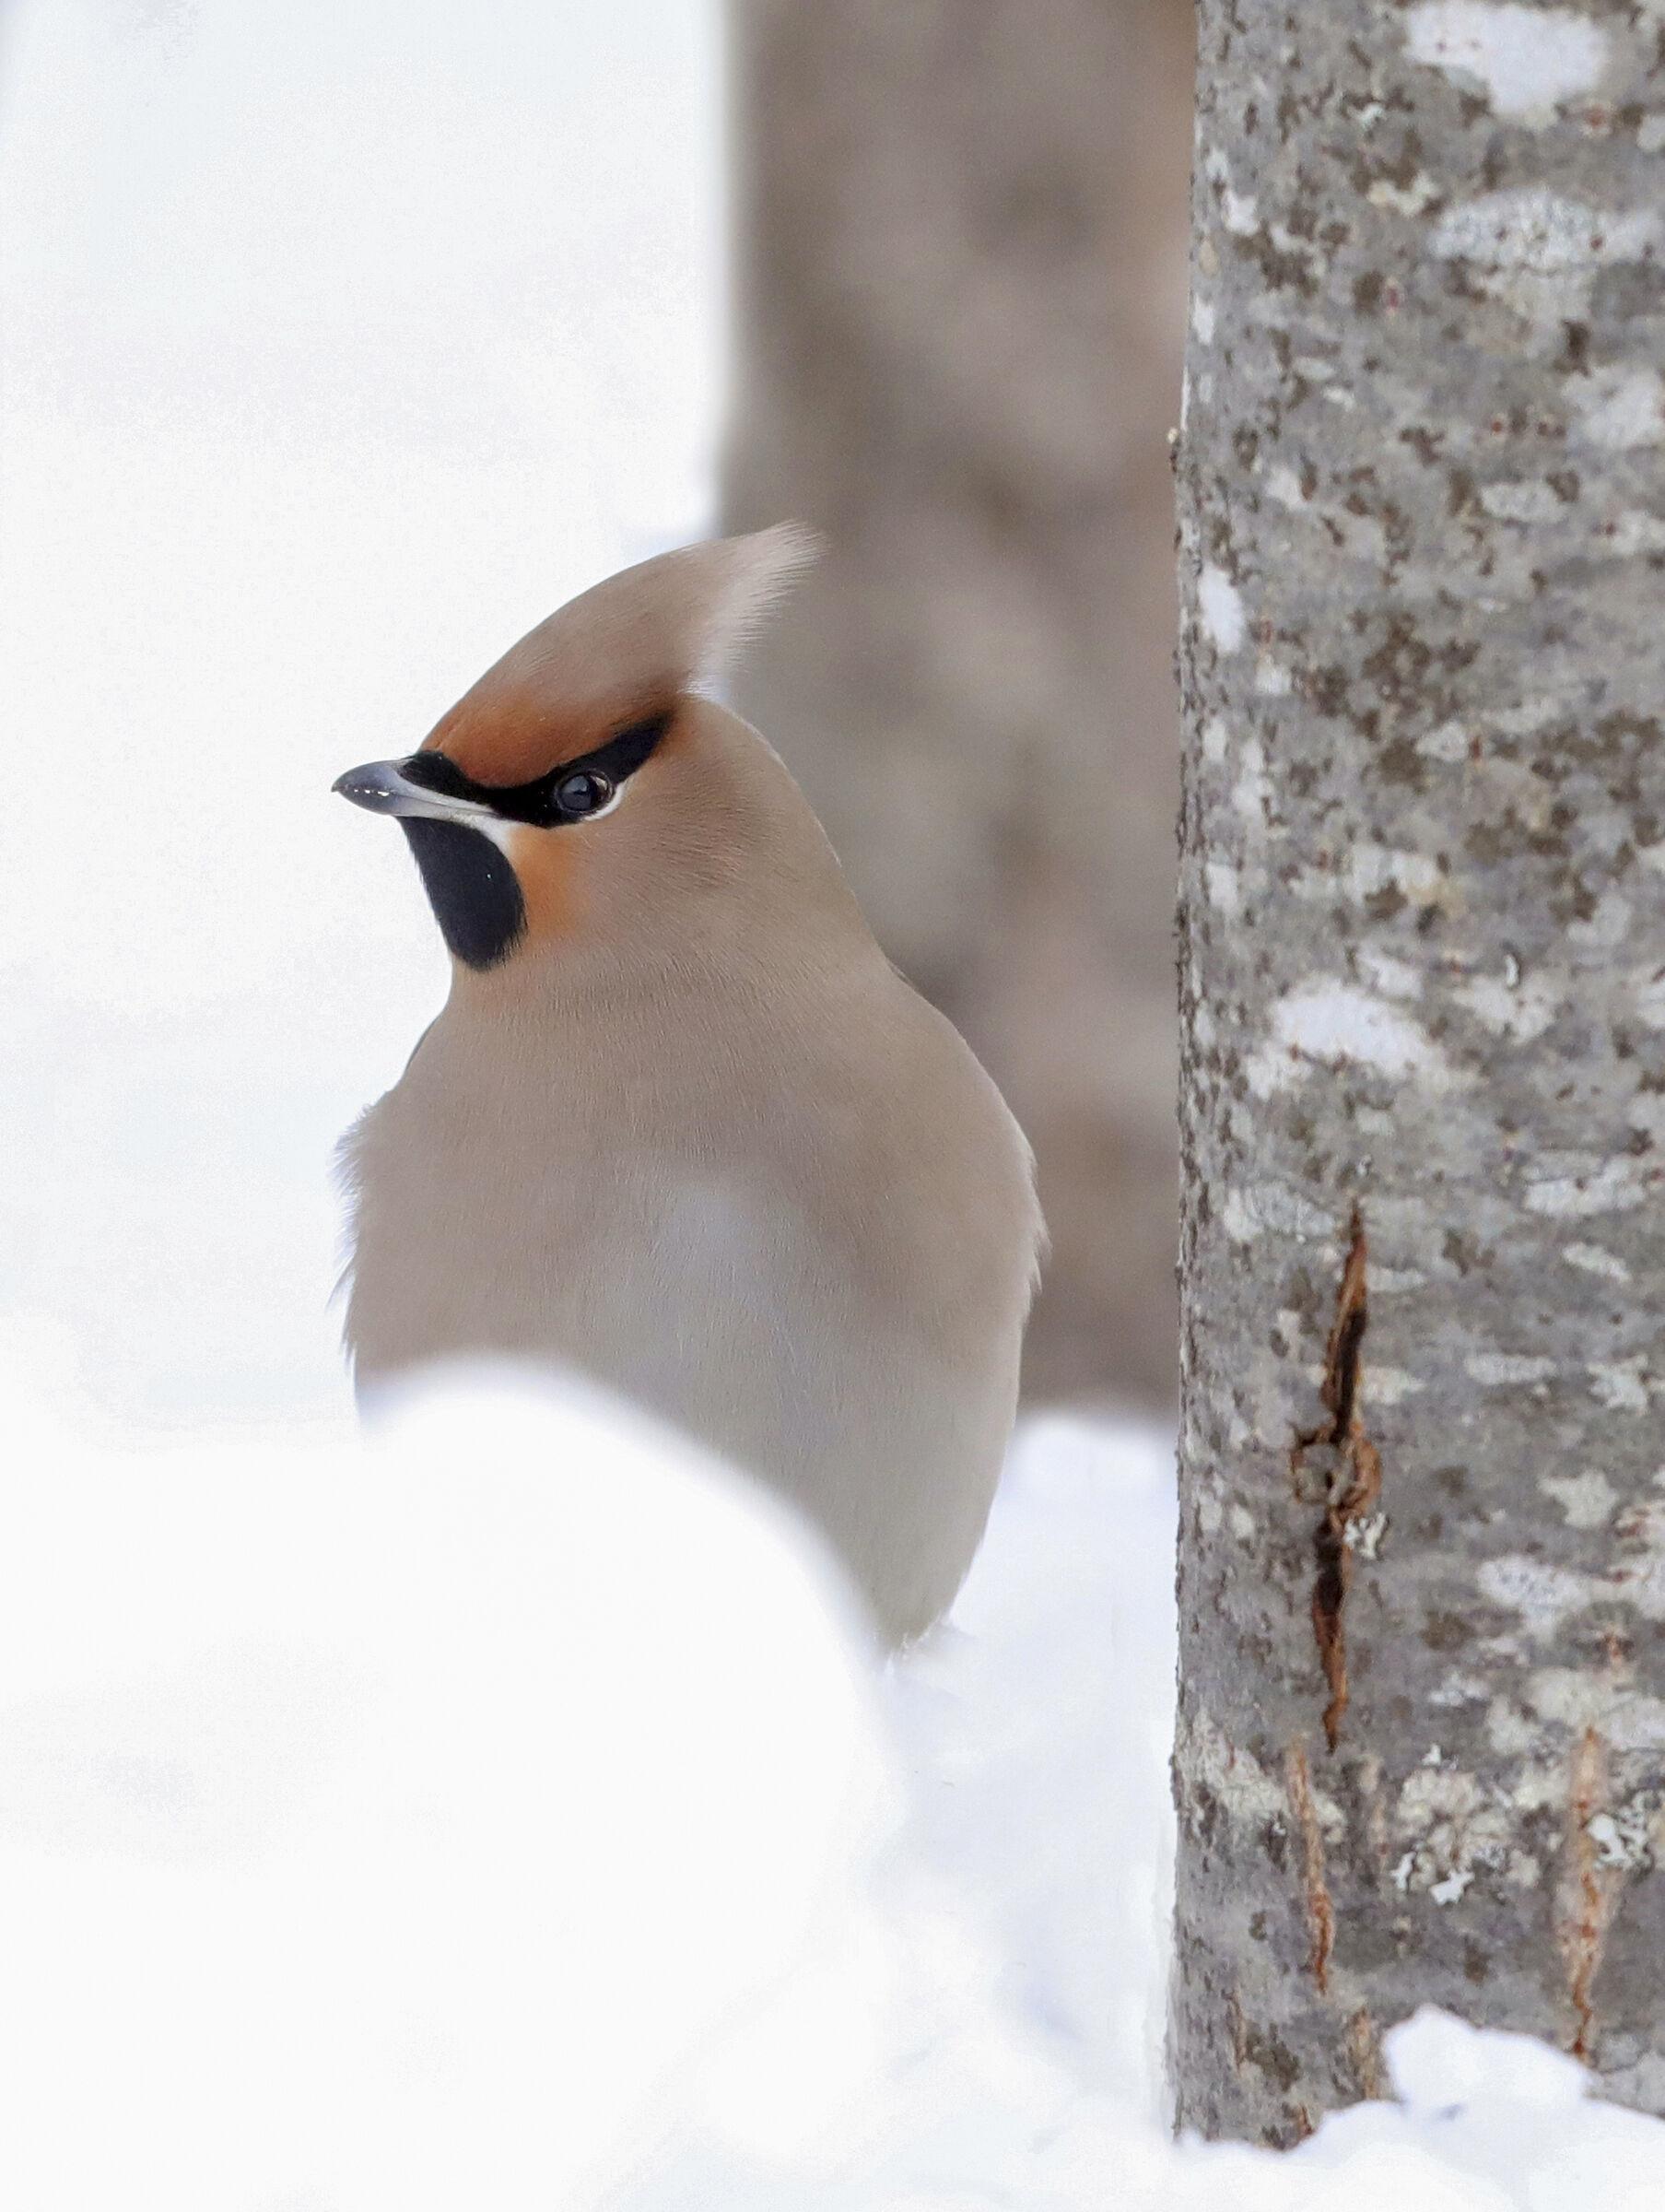 beak in the snow...